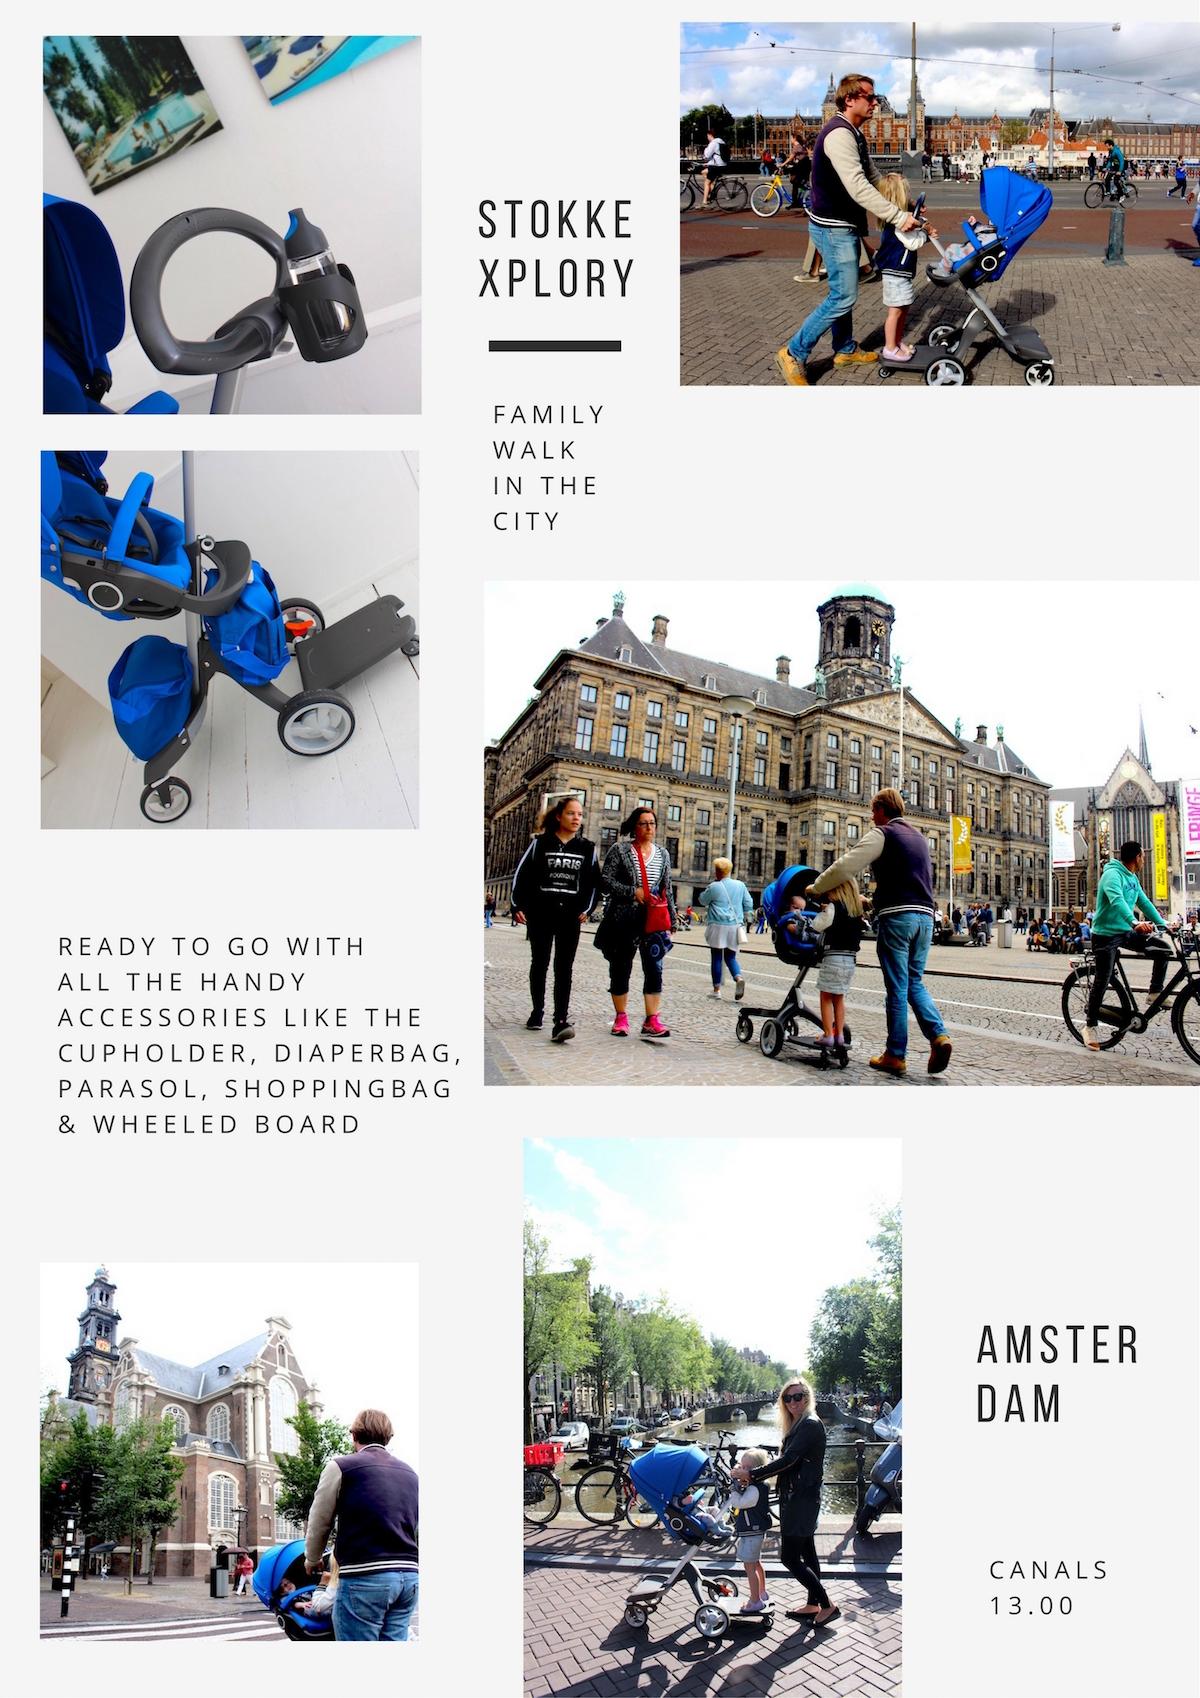 stokke-xplory-1-citymom-nl